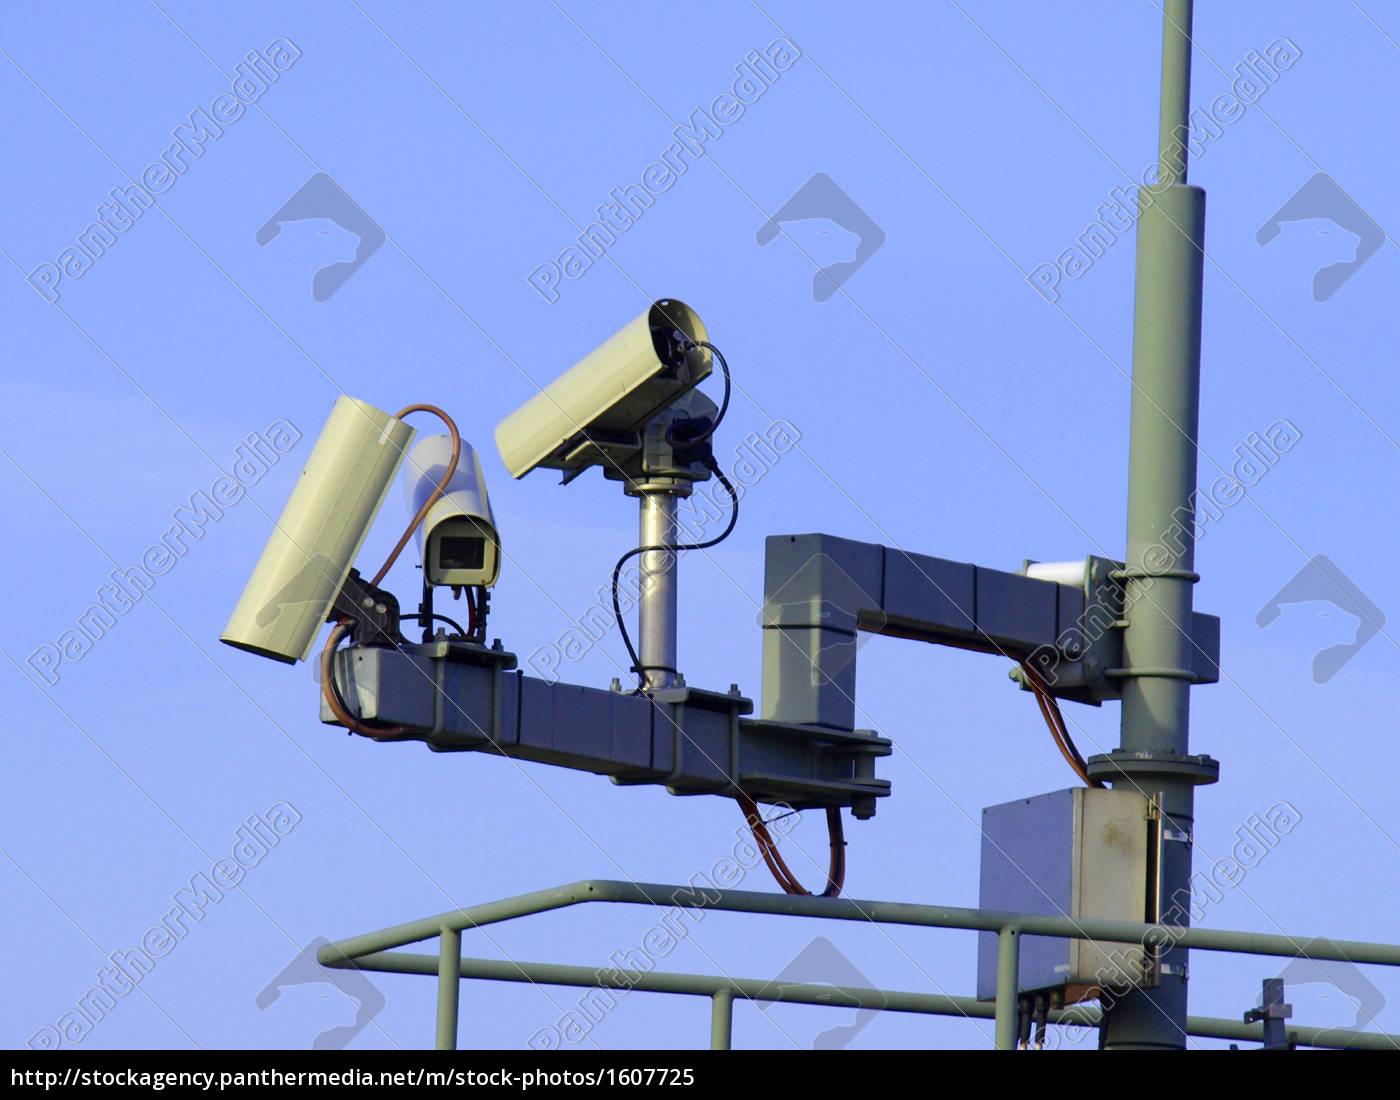 surveillance, cameras - 1607725